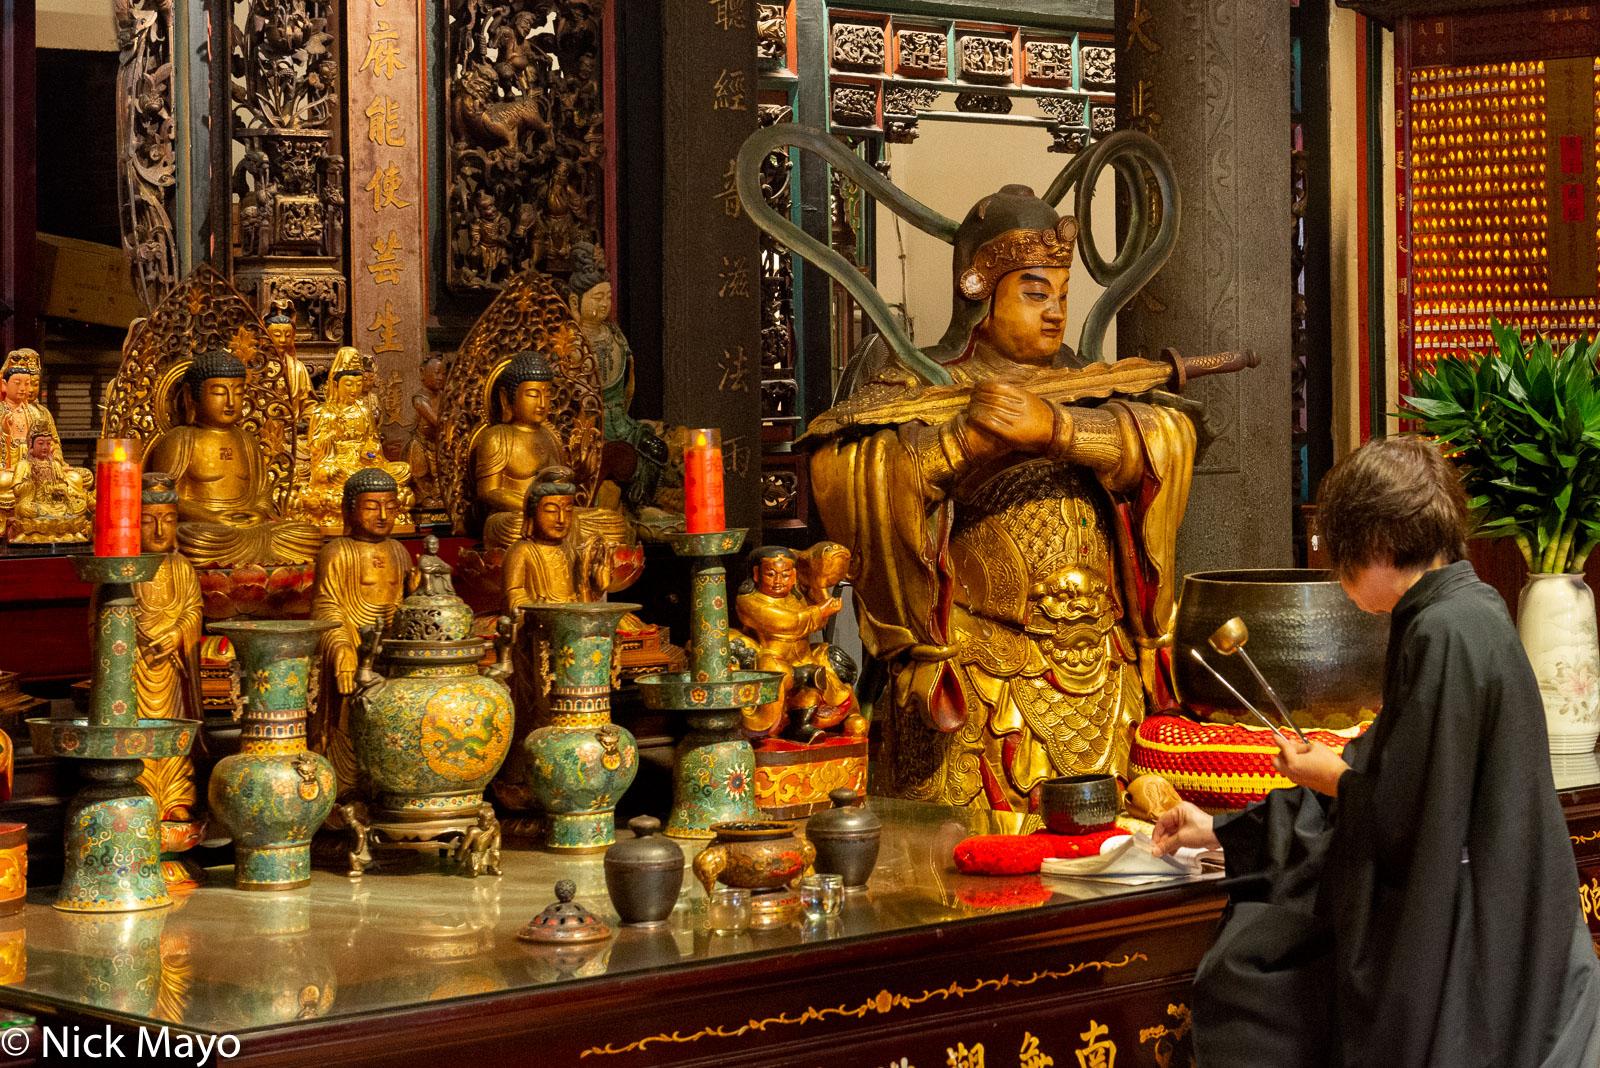 A worshipper performing bai bai at the Tamsui  Longshan temple built in 1858.